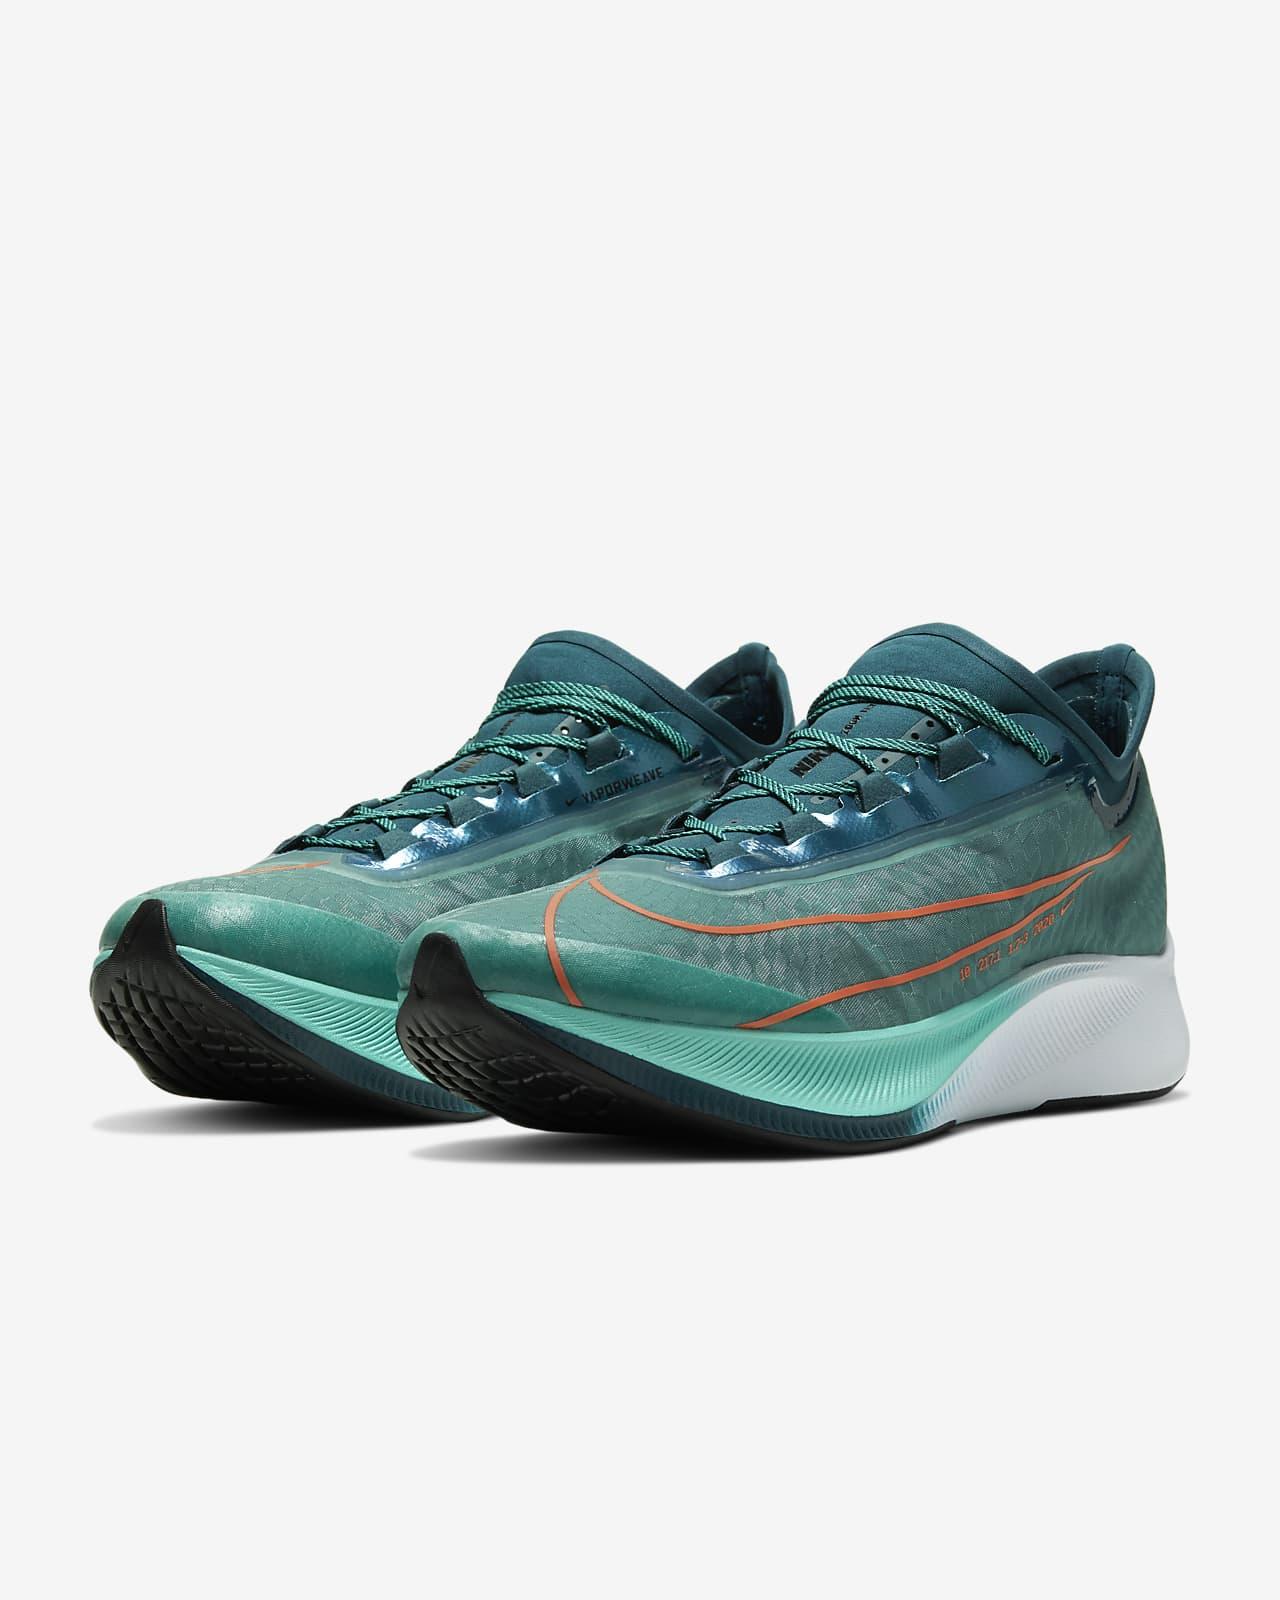 Calzado de running para hombre Nike Zoom Fly 3 Premium